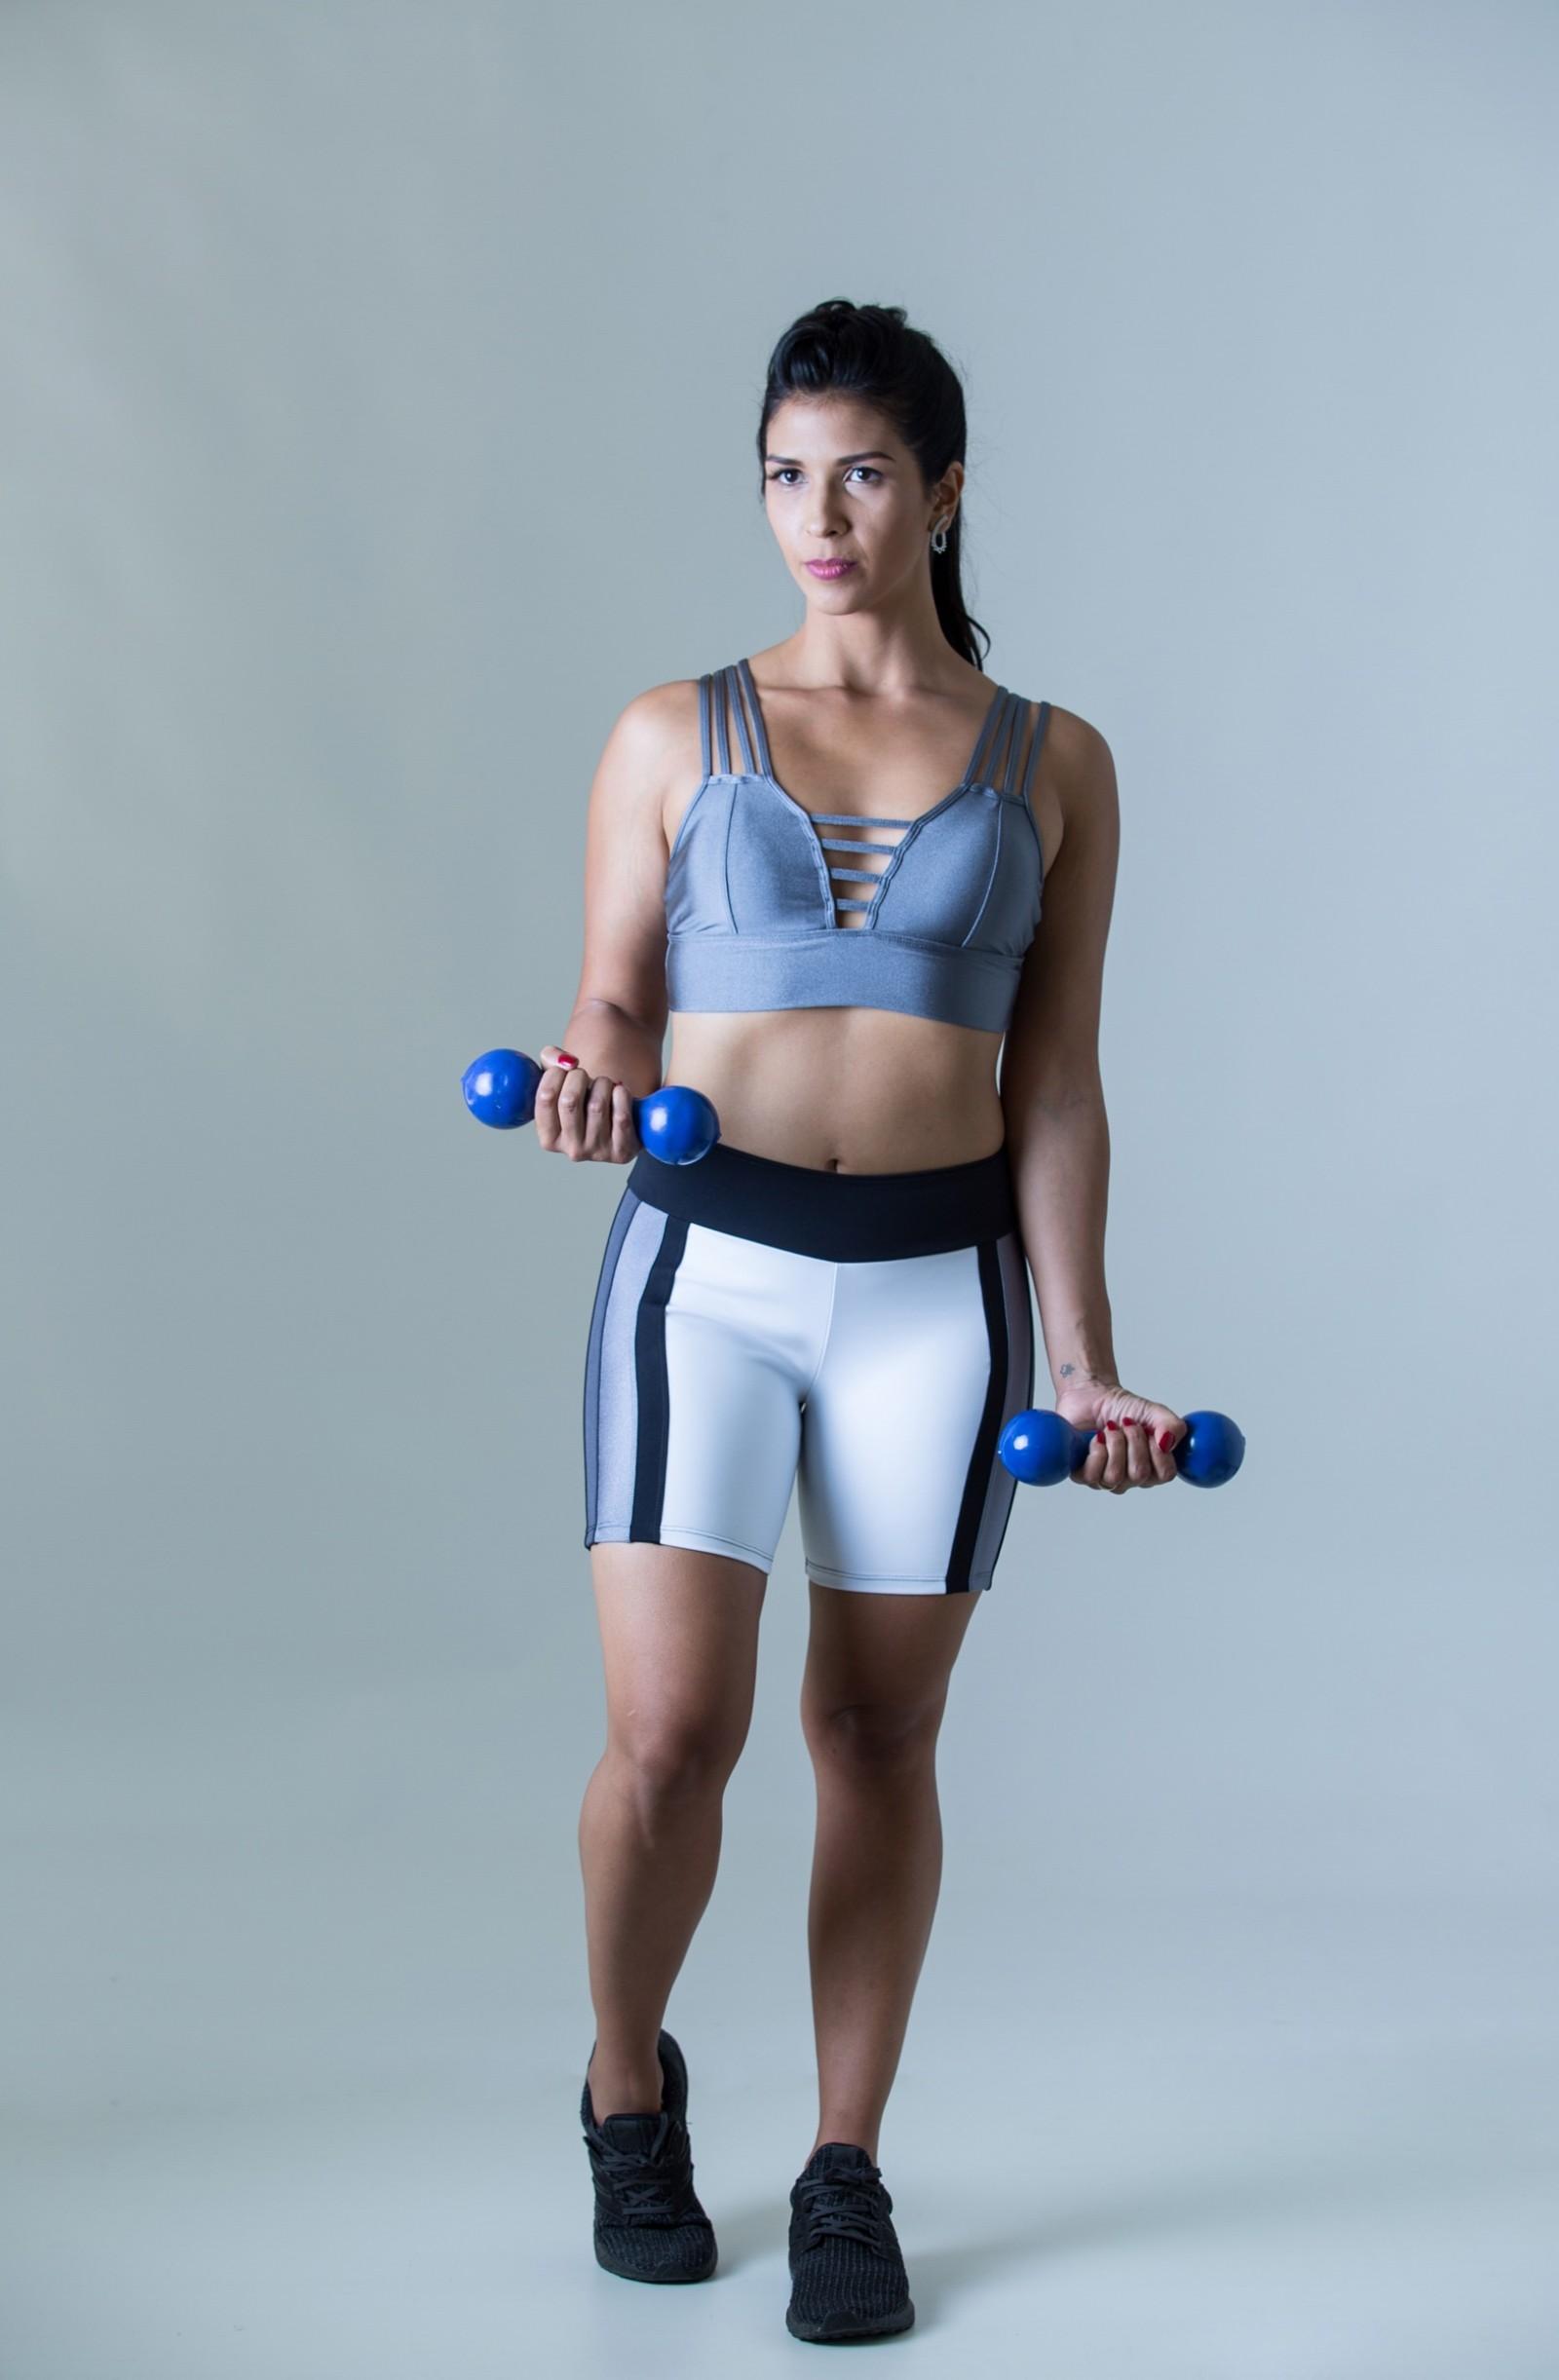 Top Fun Cinza Plat, Coleção Plenitude - NKT Fitwear Moda Fitness